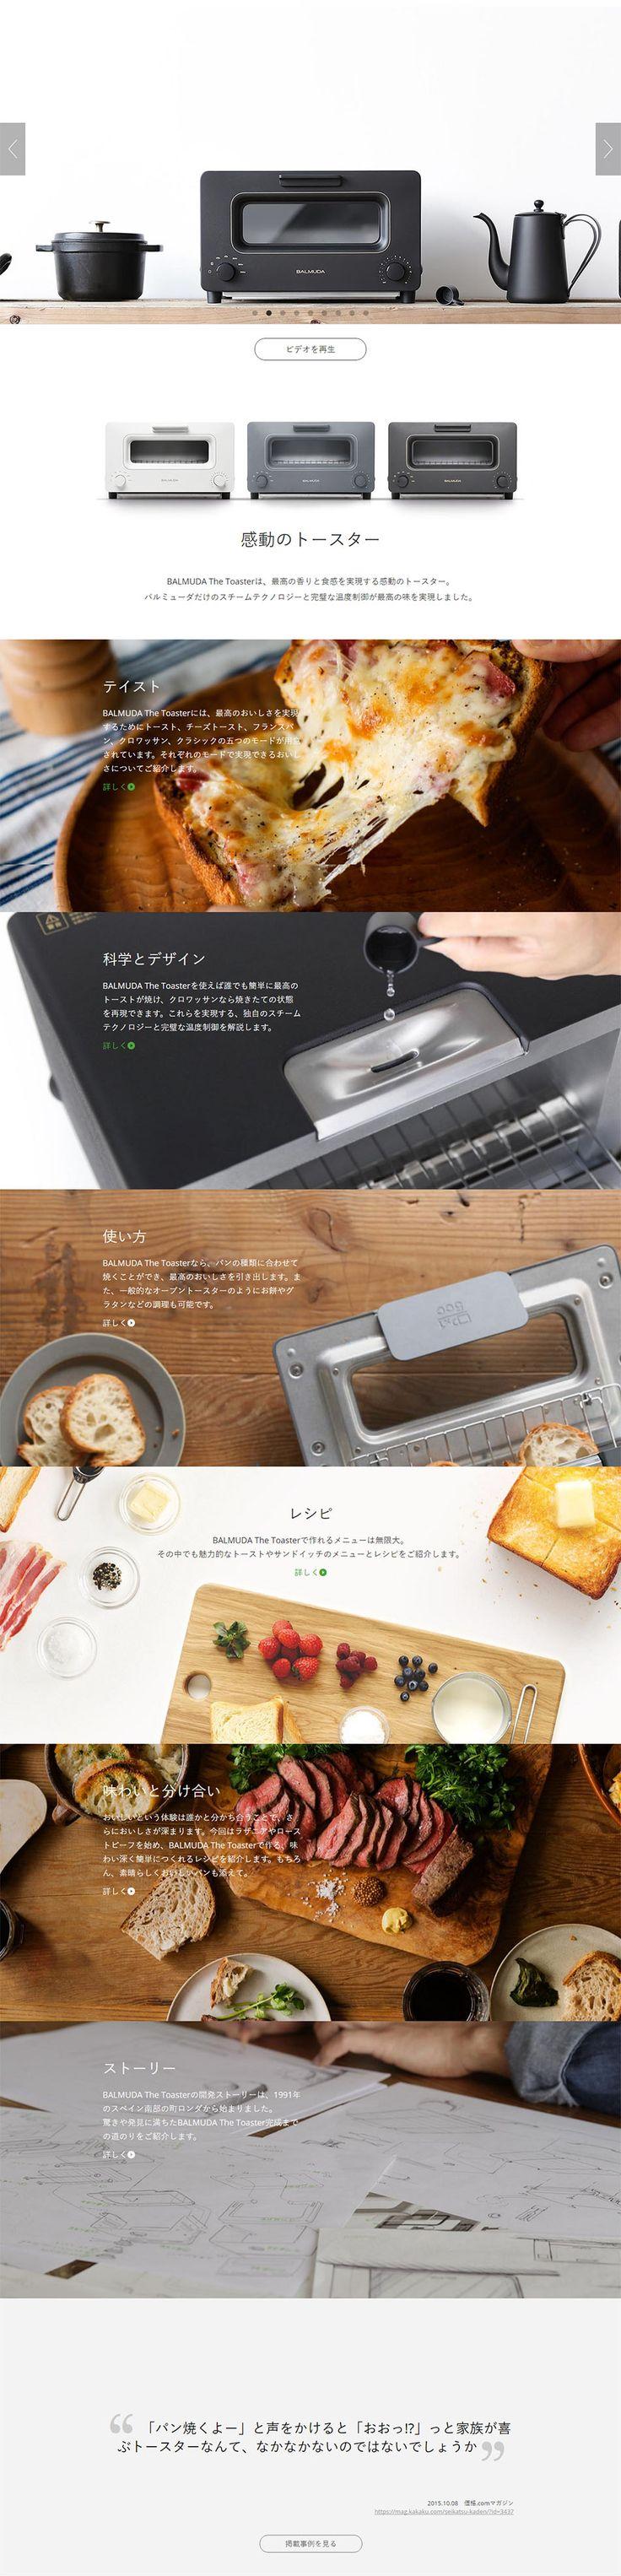 BALMUDA The Toaster【家電・パソコン・通信関連】のLPデザイン。WEBデザイナーさん必見!ランディングページのデザイン参考に(シンプル系)